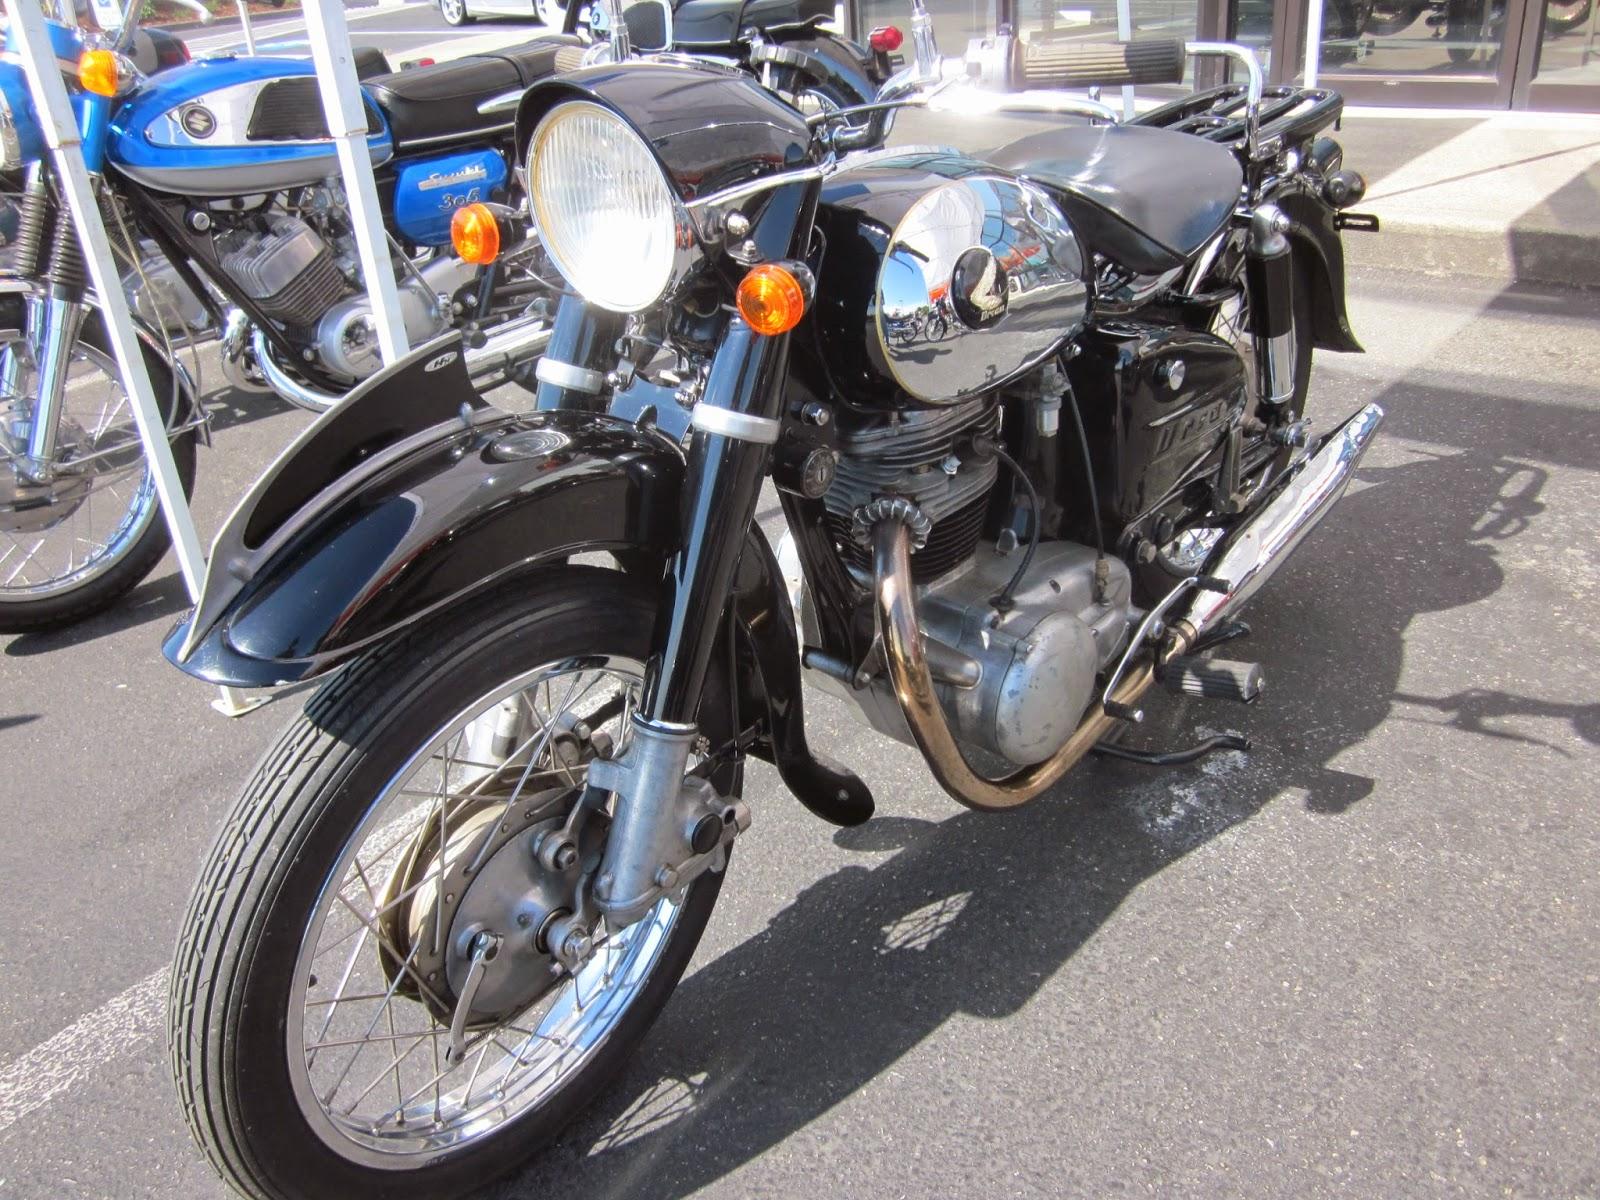 Oldmotodude 1957 honda dream on display at the 2014 vjmc for Hinshaw honda auburn wa